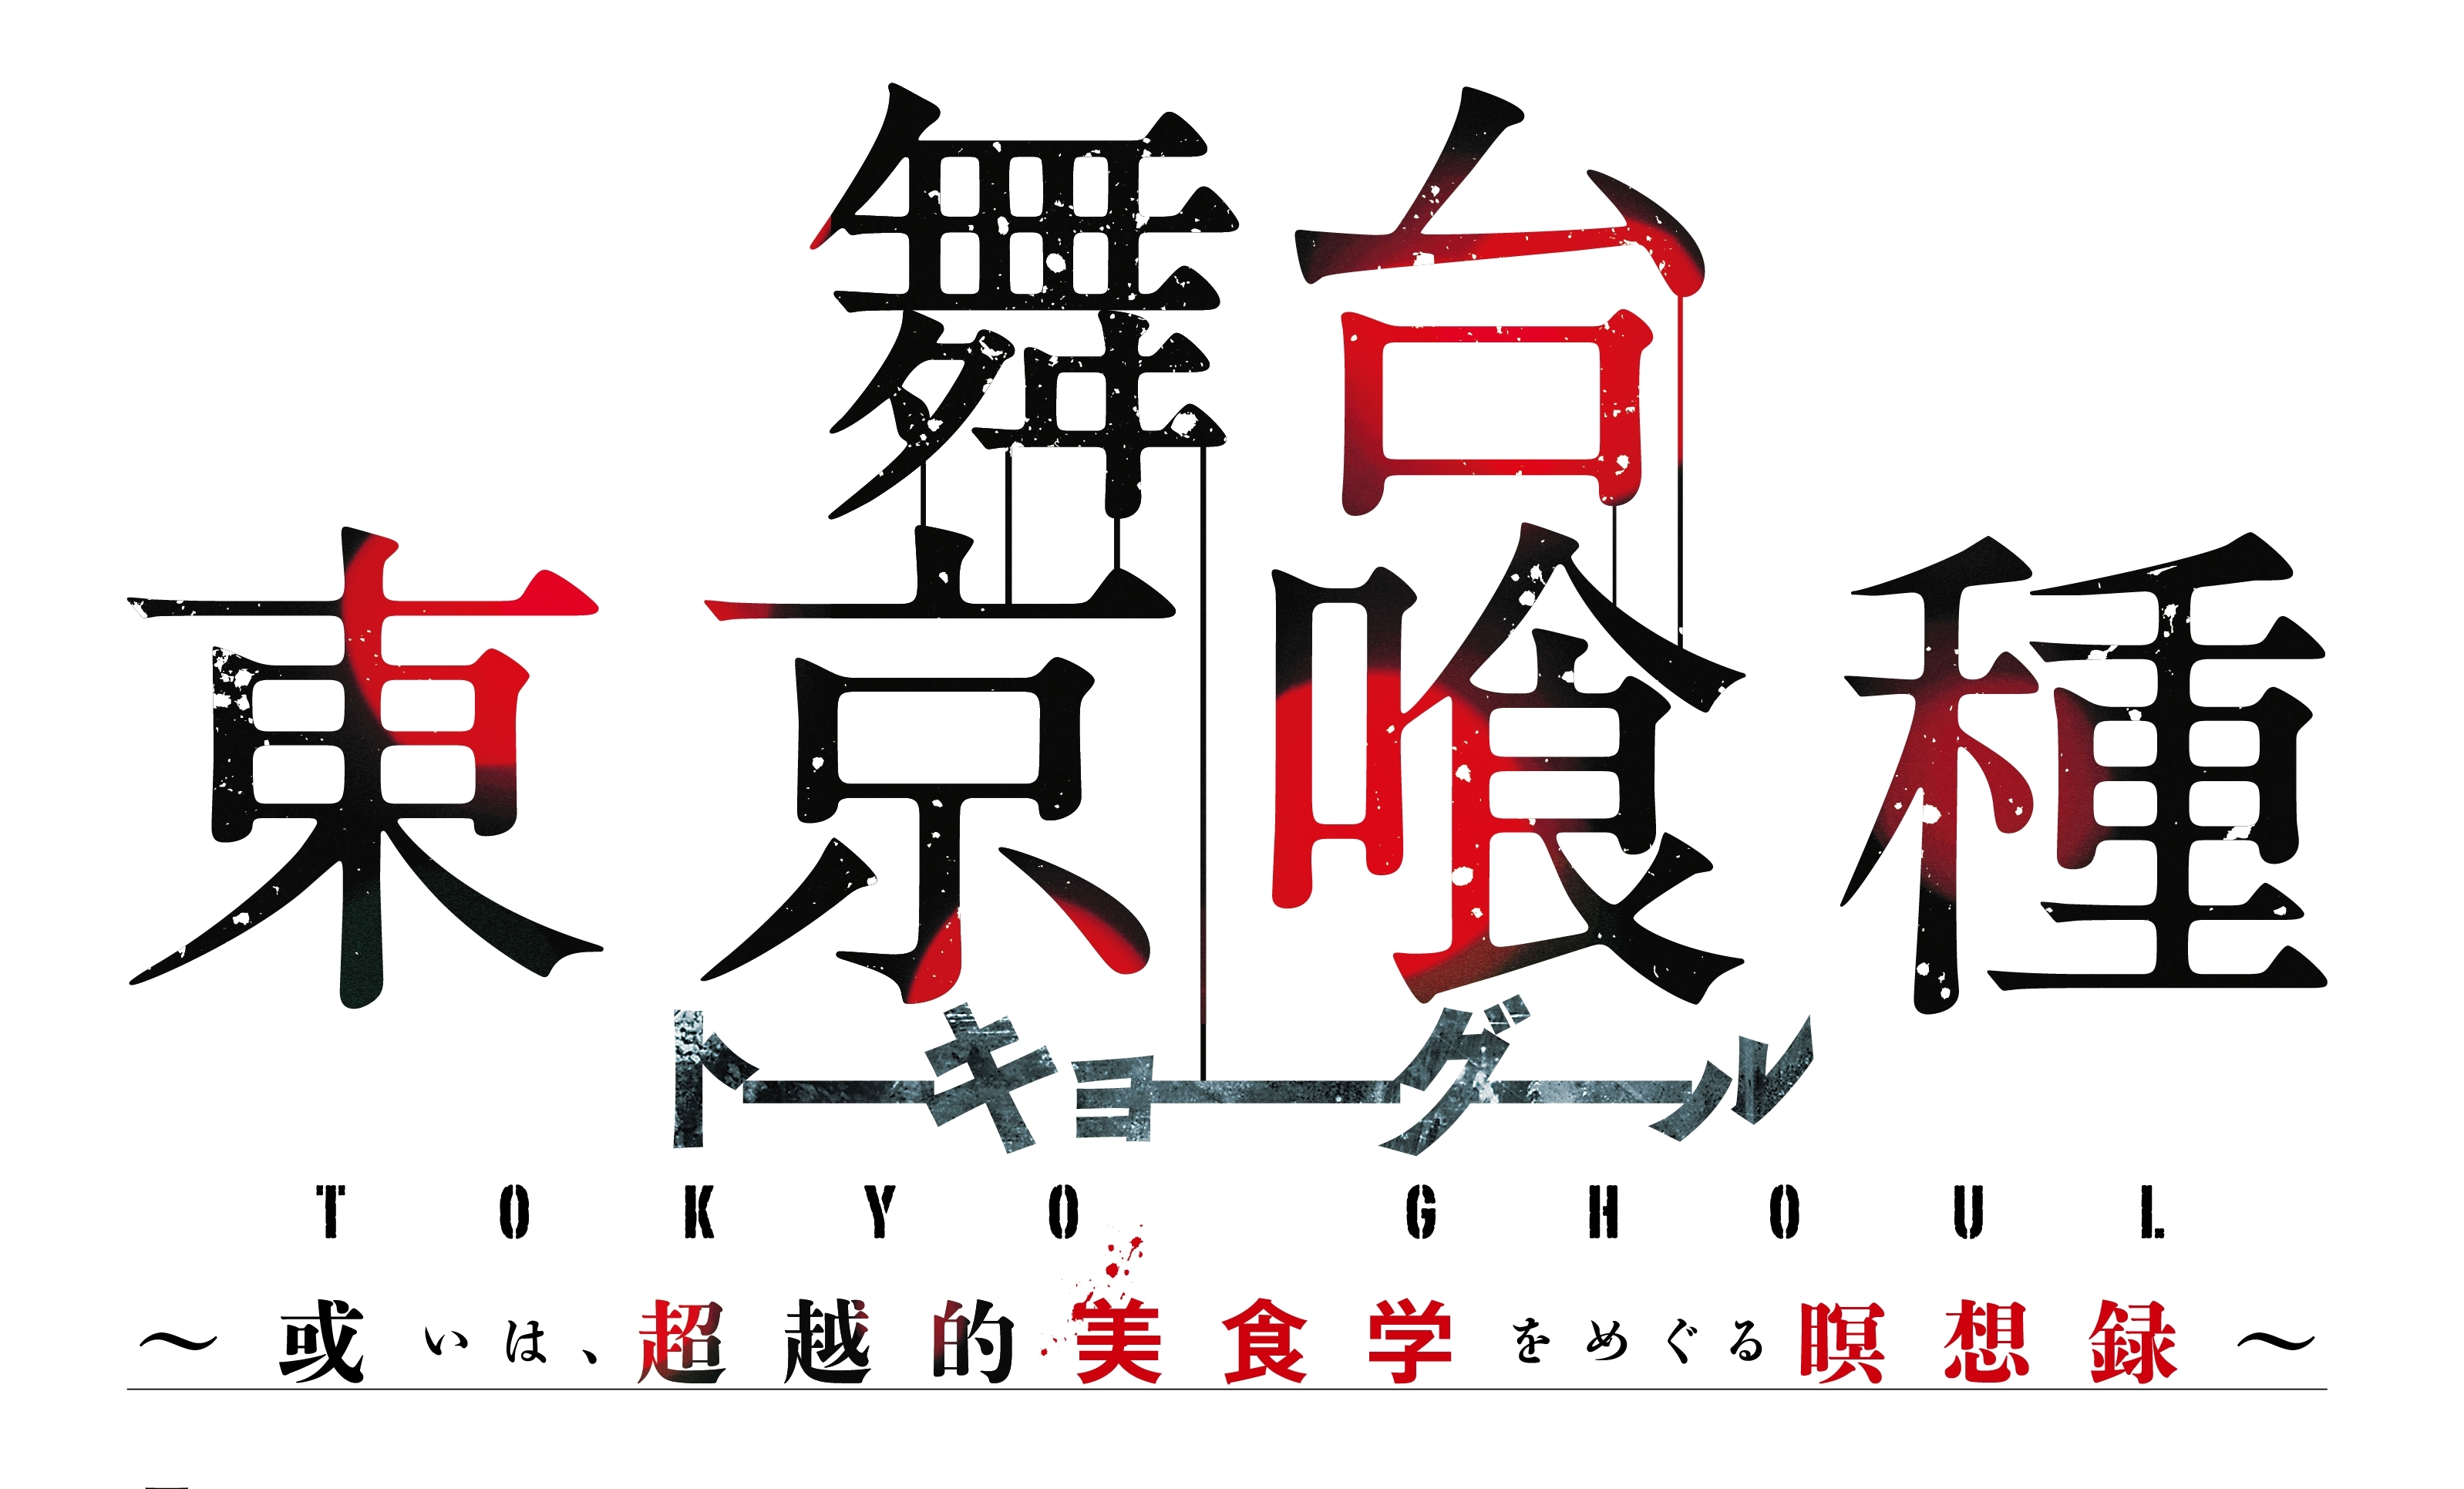 (C)石田スイ/集英社 (C)舞台『東京喰種トーキョーグール』製作委員会